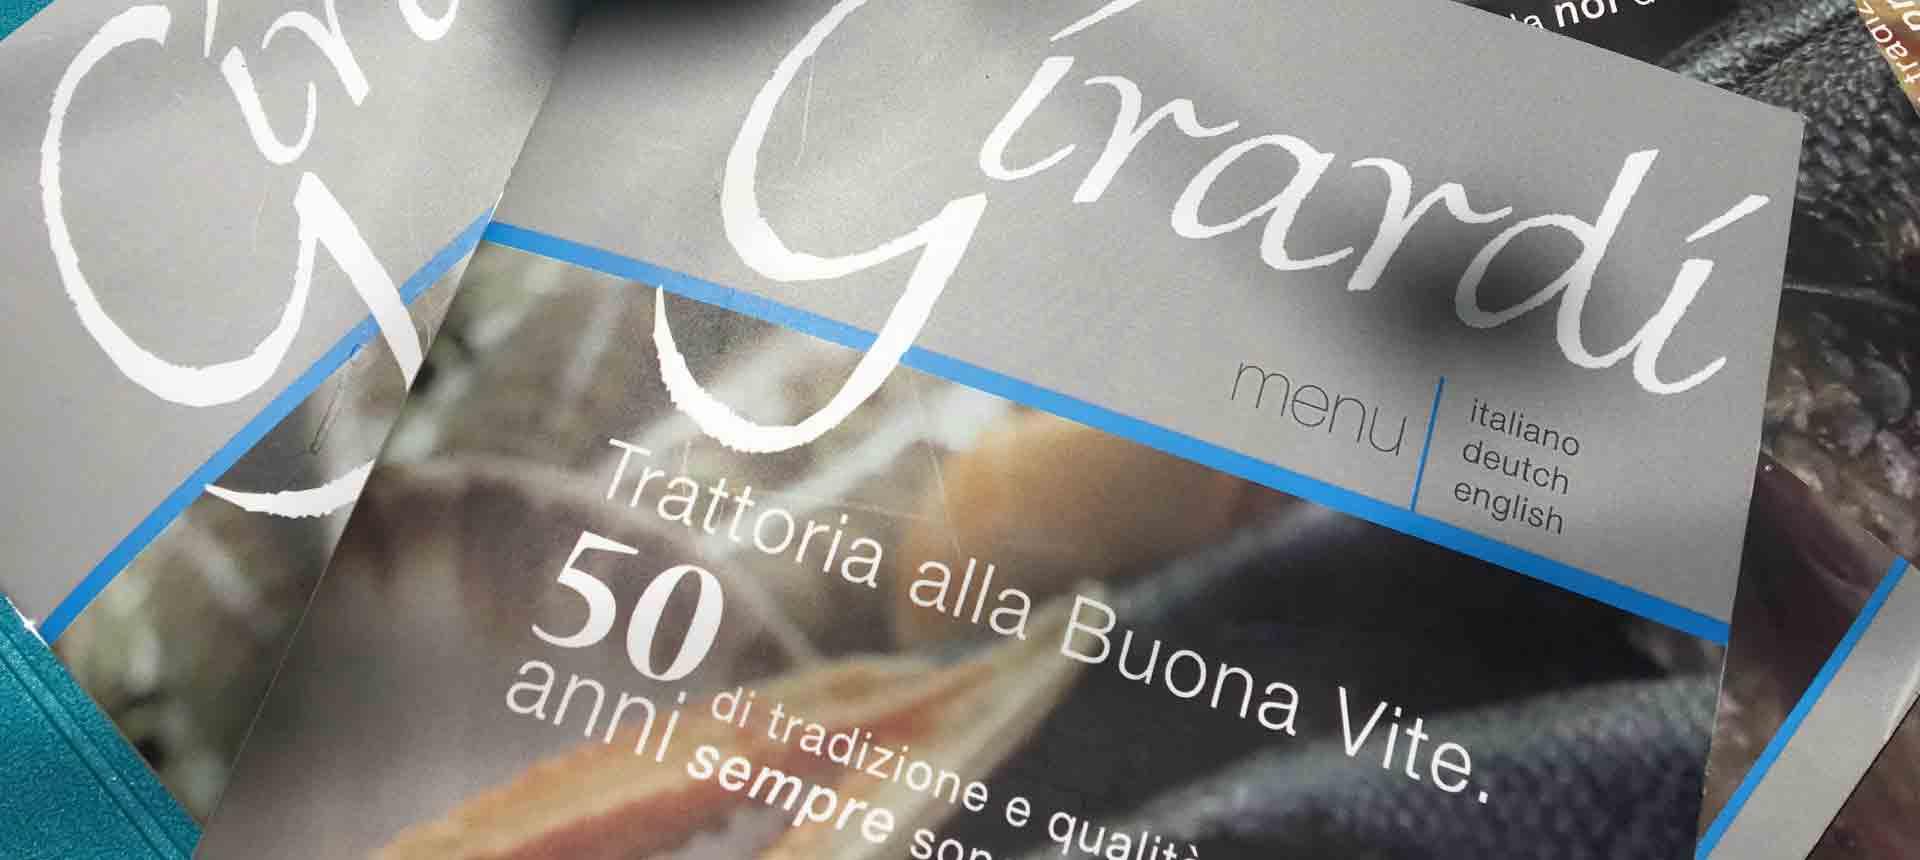 Trattoria-alla-buona-Vite-Specialita-pesce---Grado-Aquileia-Belvedere-di-Grado-home